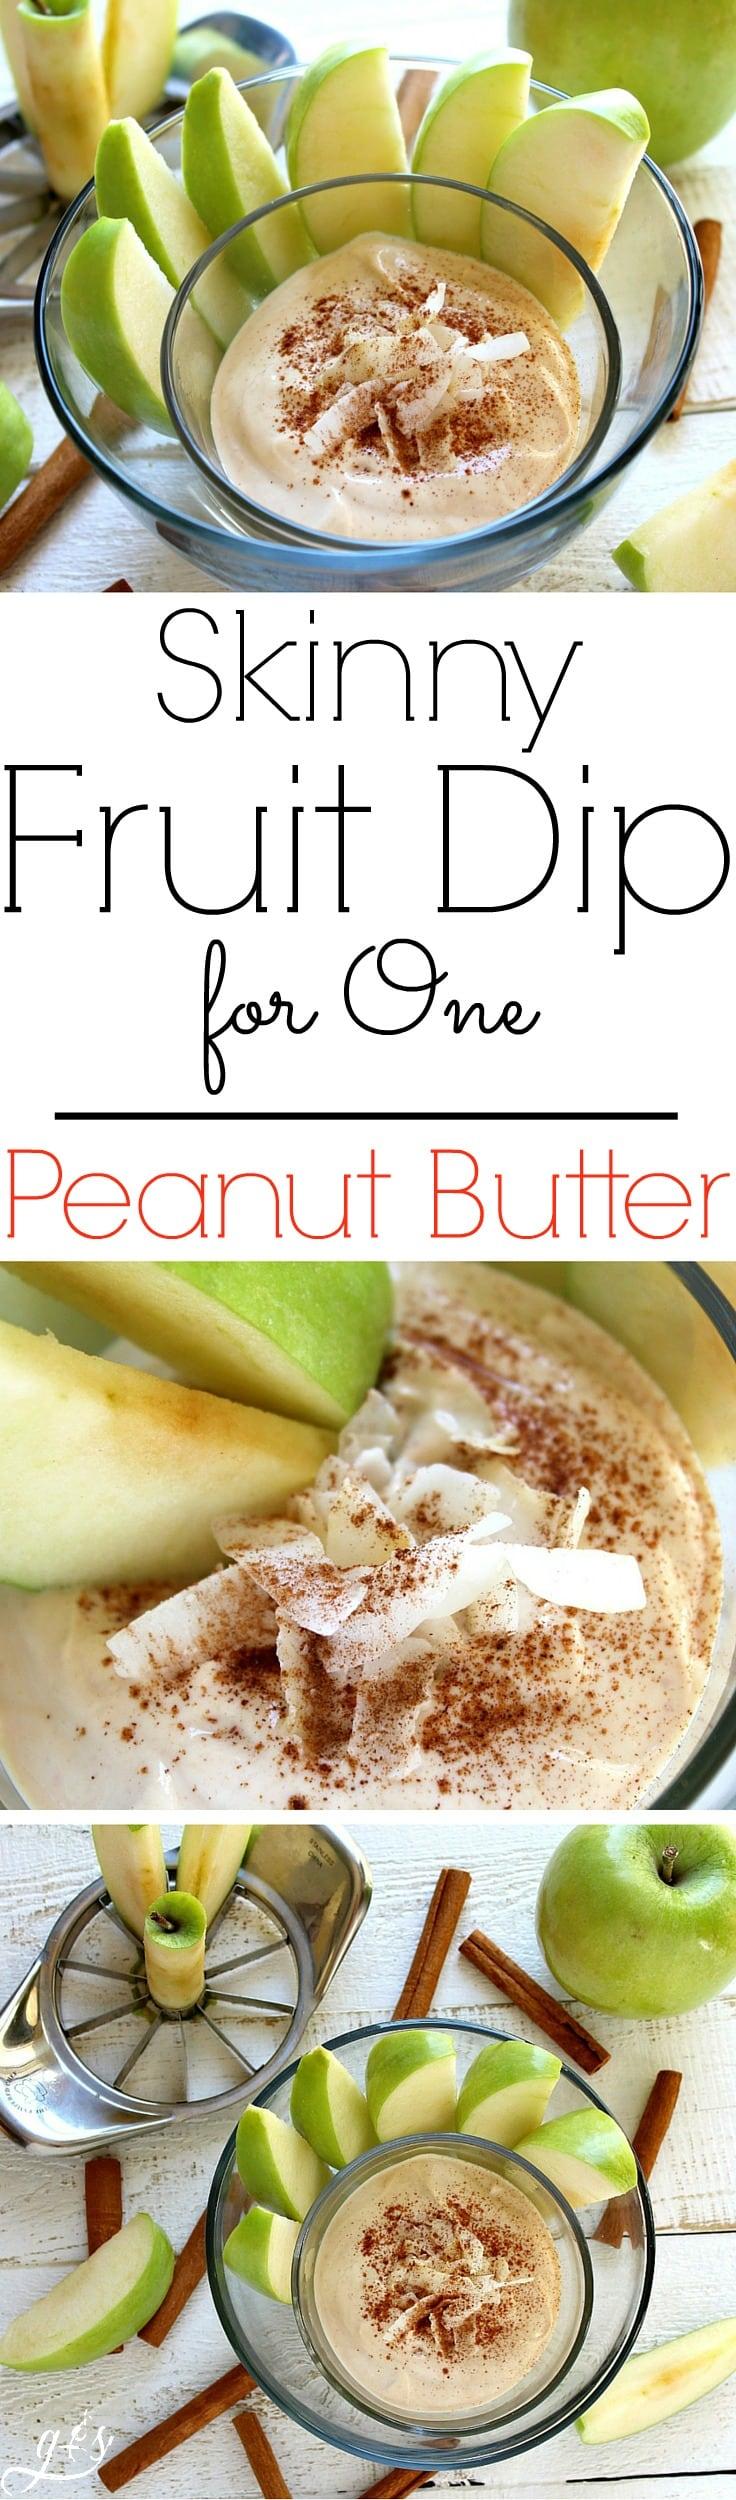 Skinny Fruit Dip for One  Peanut Butter